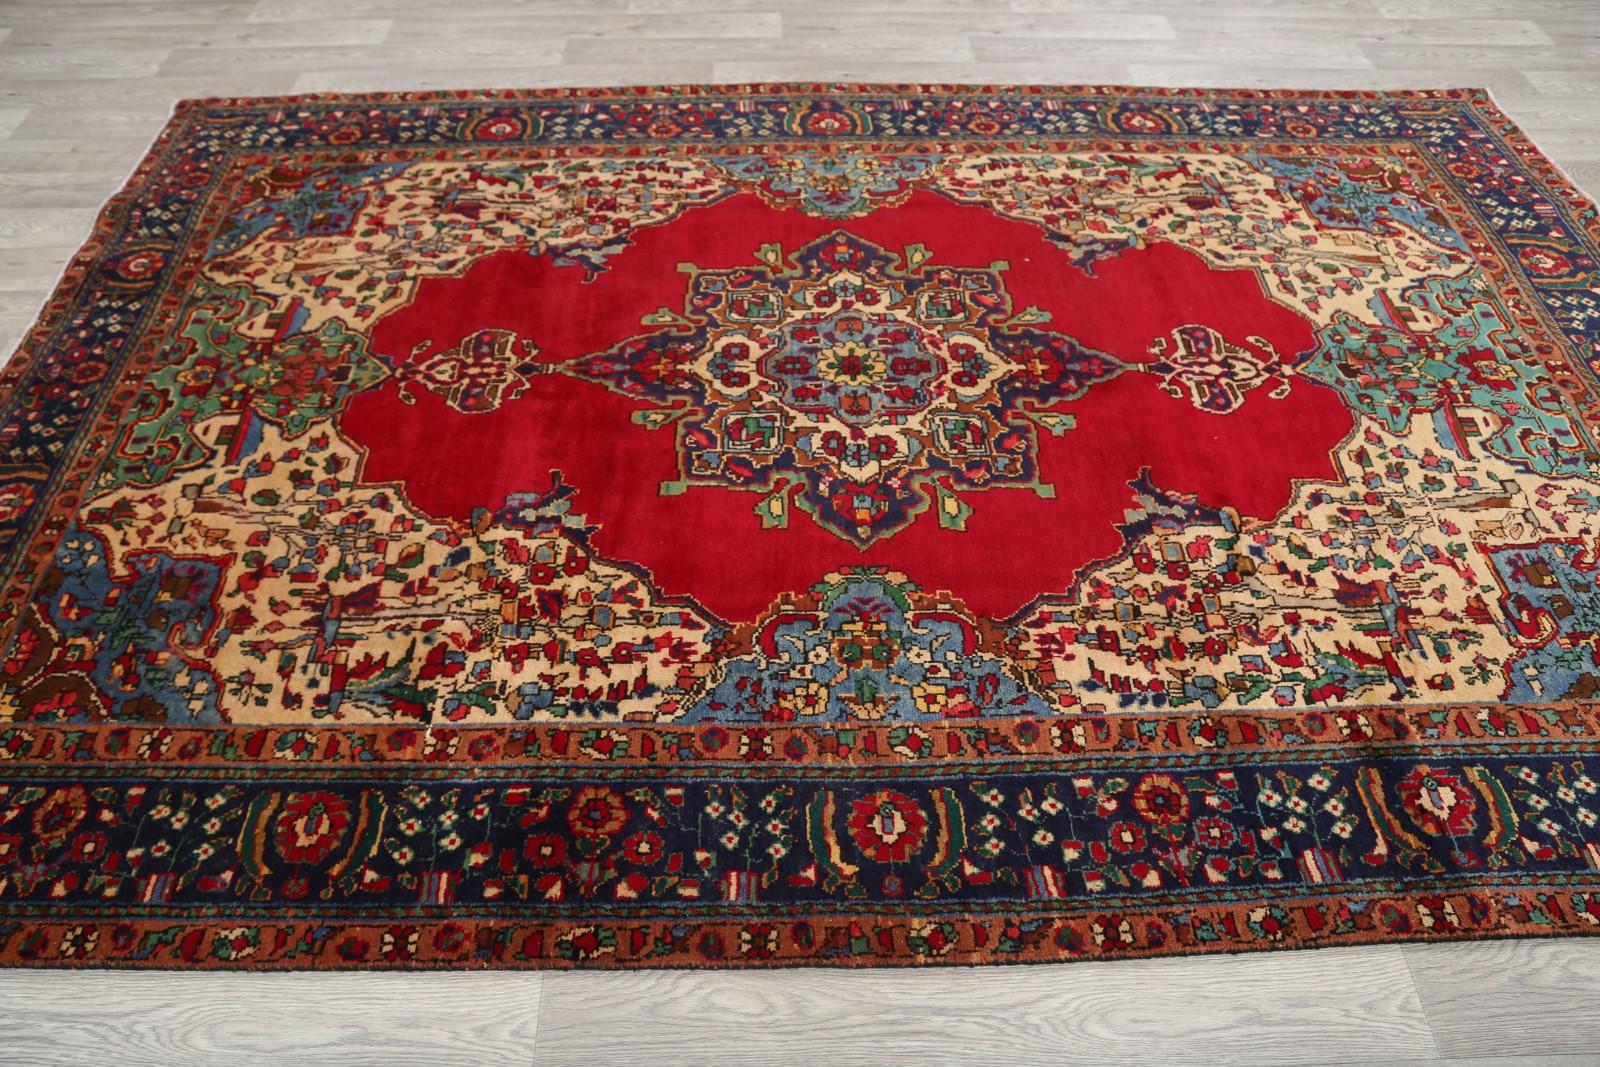 clearance sale 7x10 tabriz persian area rug wool oriental carpet 10 39 2 x 6 39 8 ebay. Black Bedroom Furniture Sets. Home Design Ideas